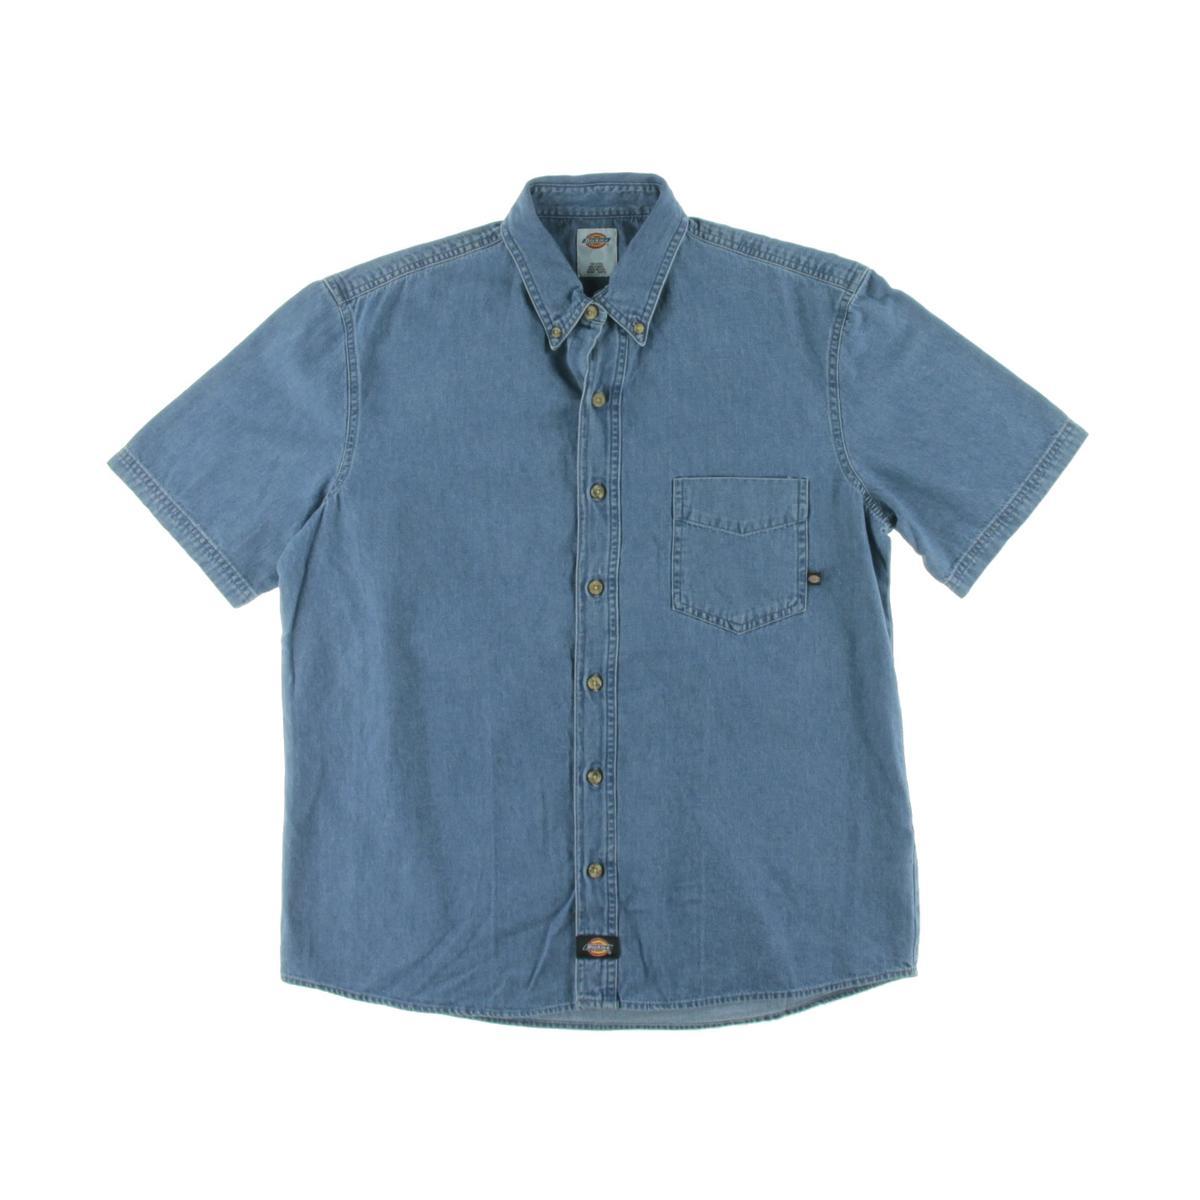 Dickies 6563 mens work denim button down shirt bhfo ebay for Denim button down shirts